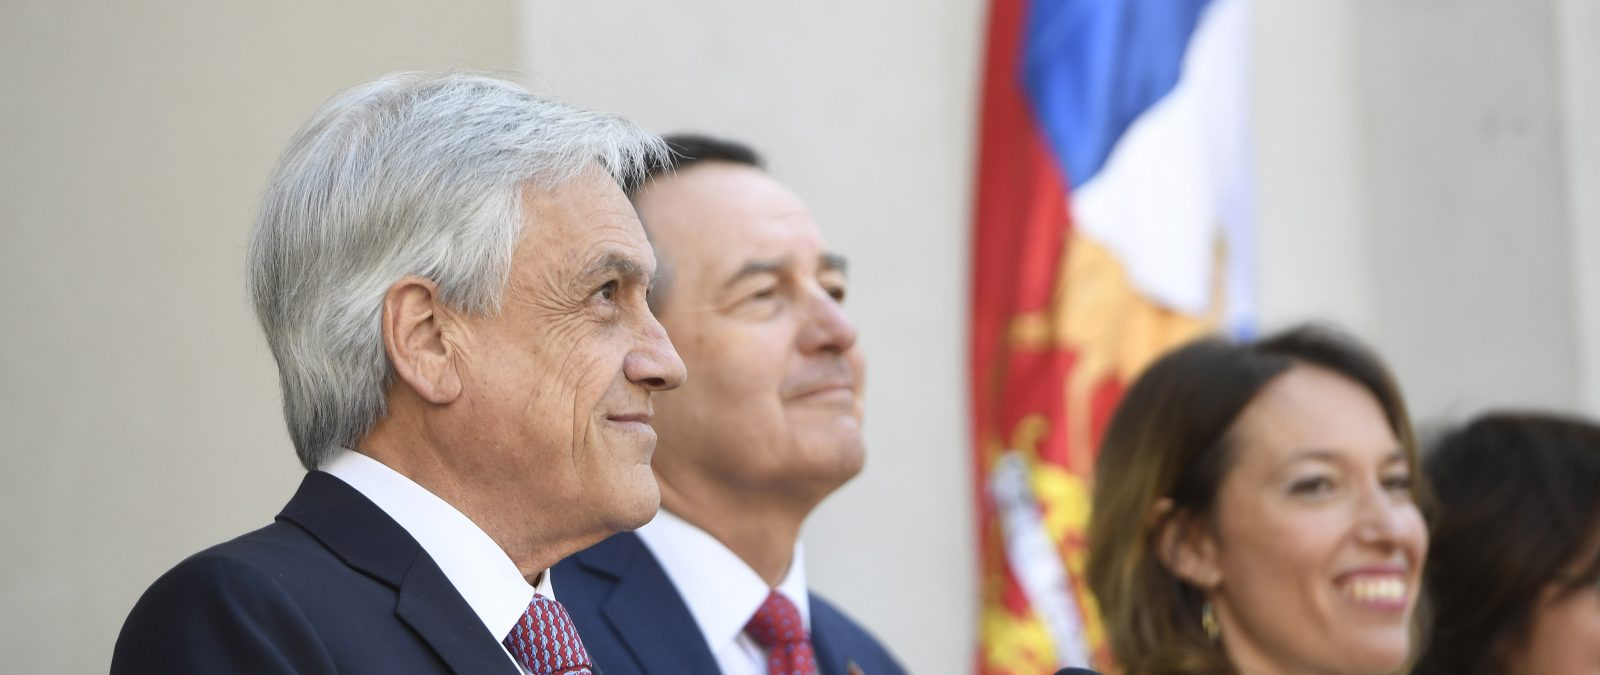 Presidente Piñera valora triunfo de Chile en la Corte Internacional de Justicia